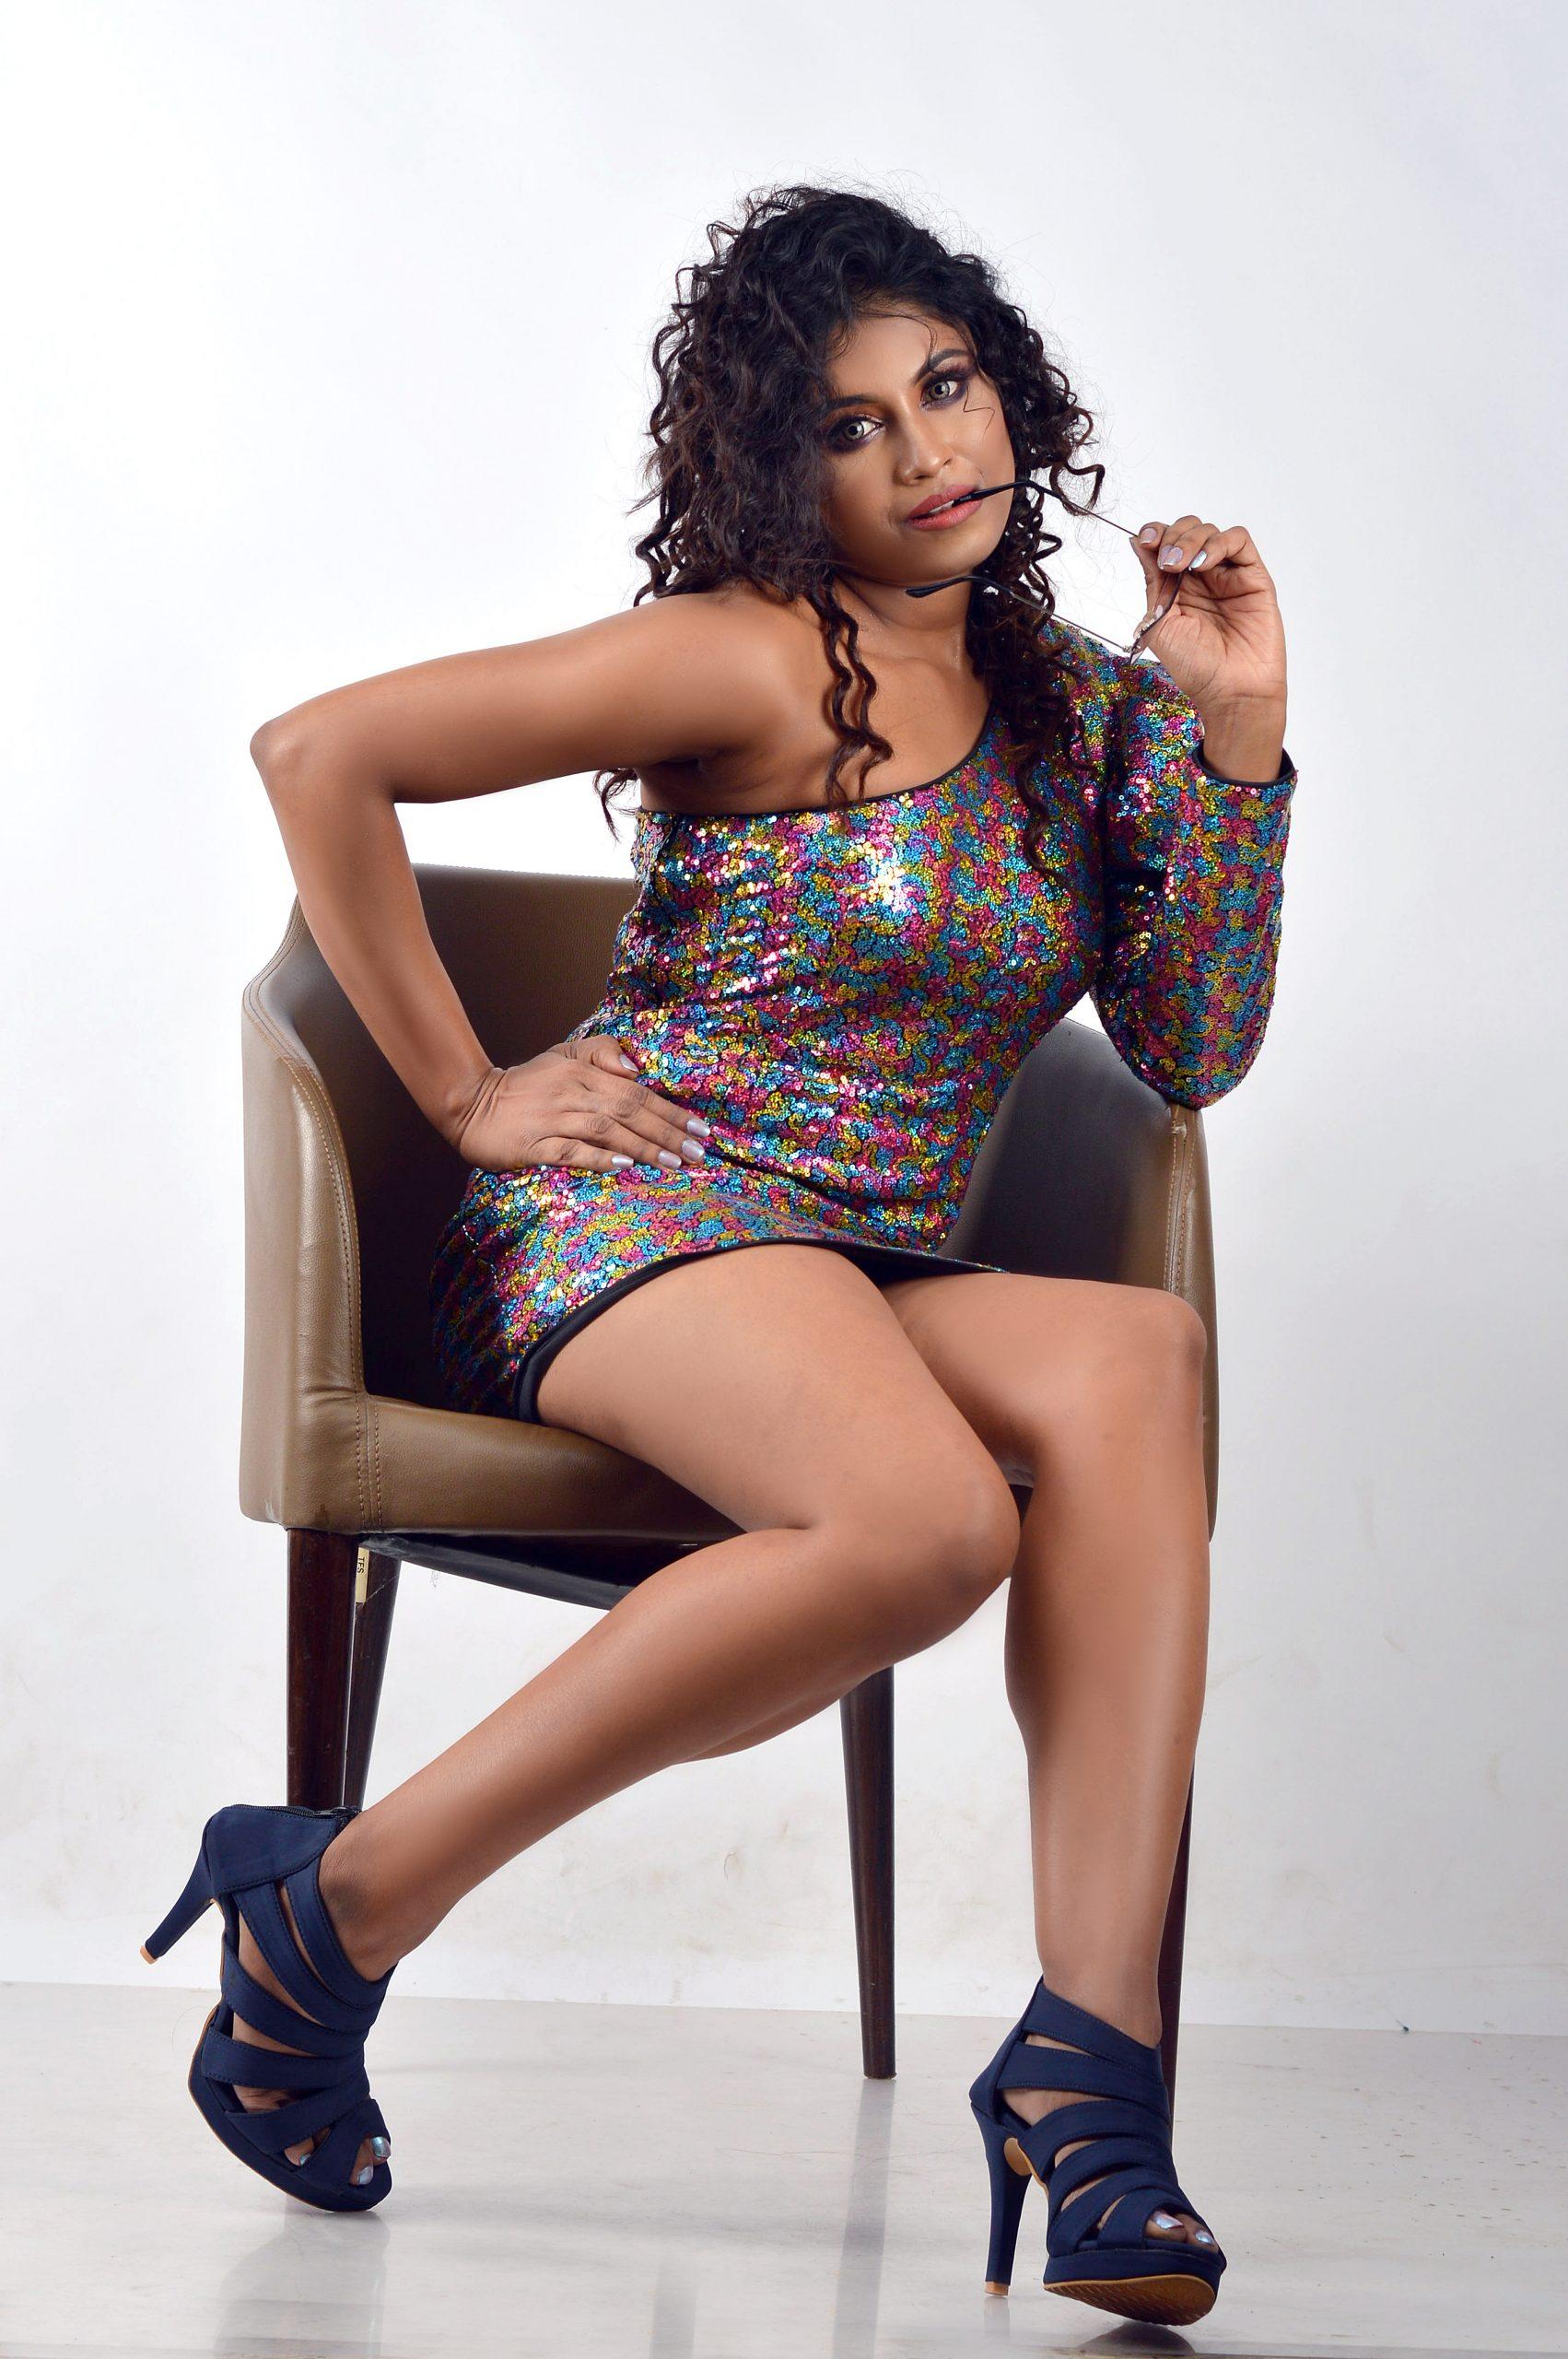 Stylish female model posing in western dress